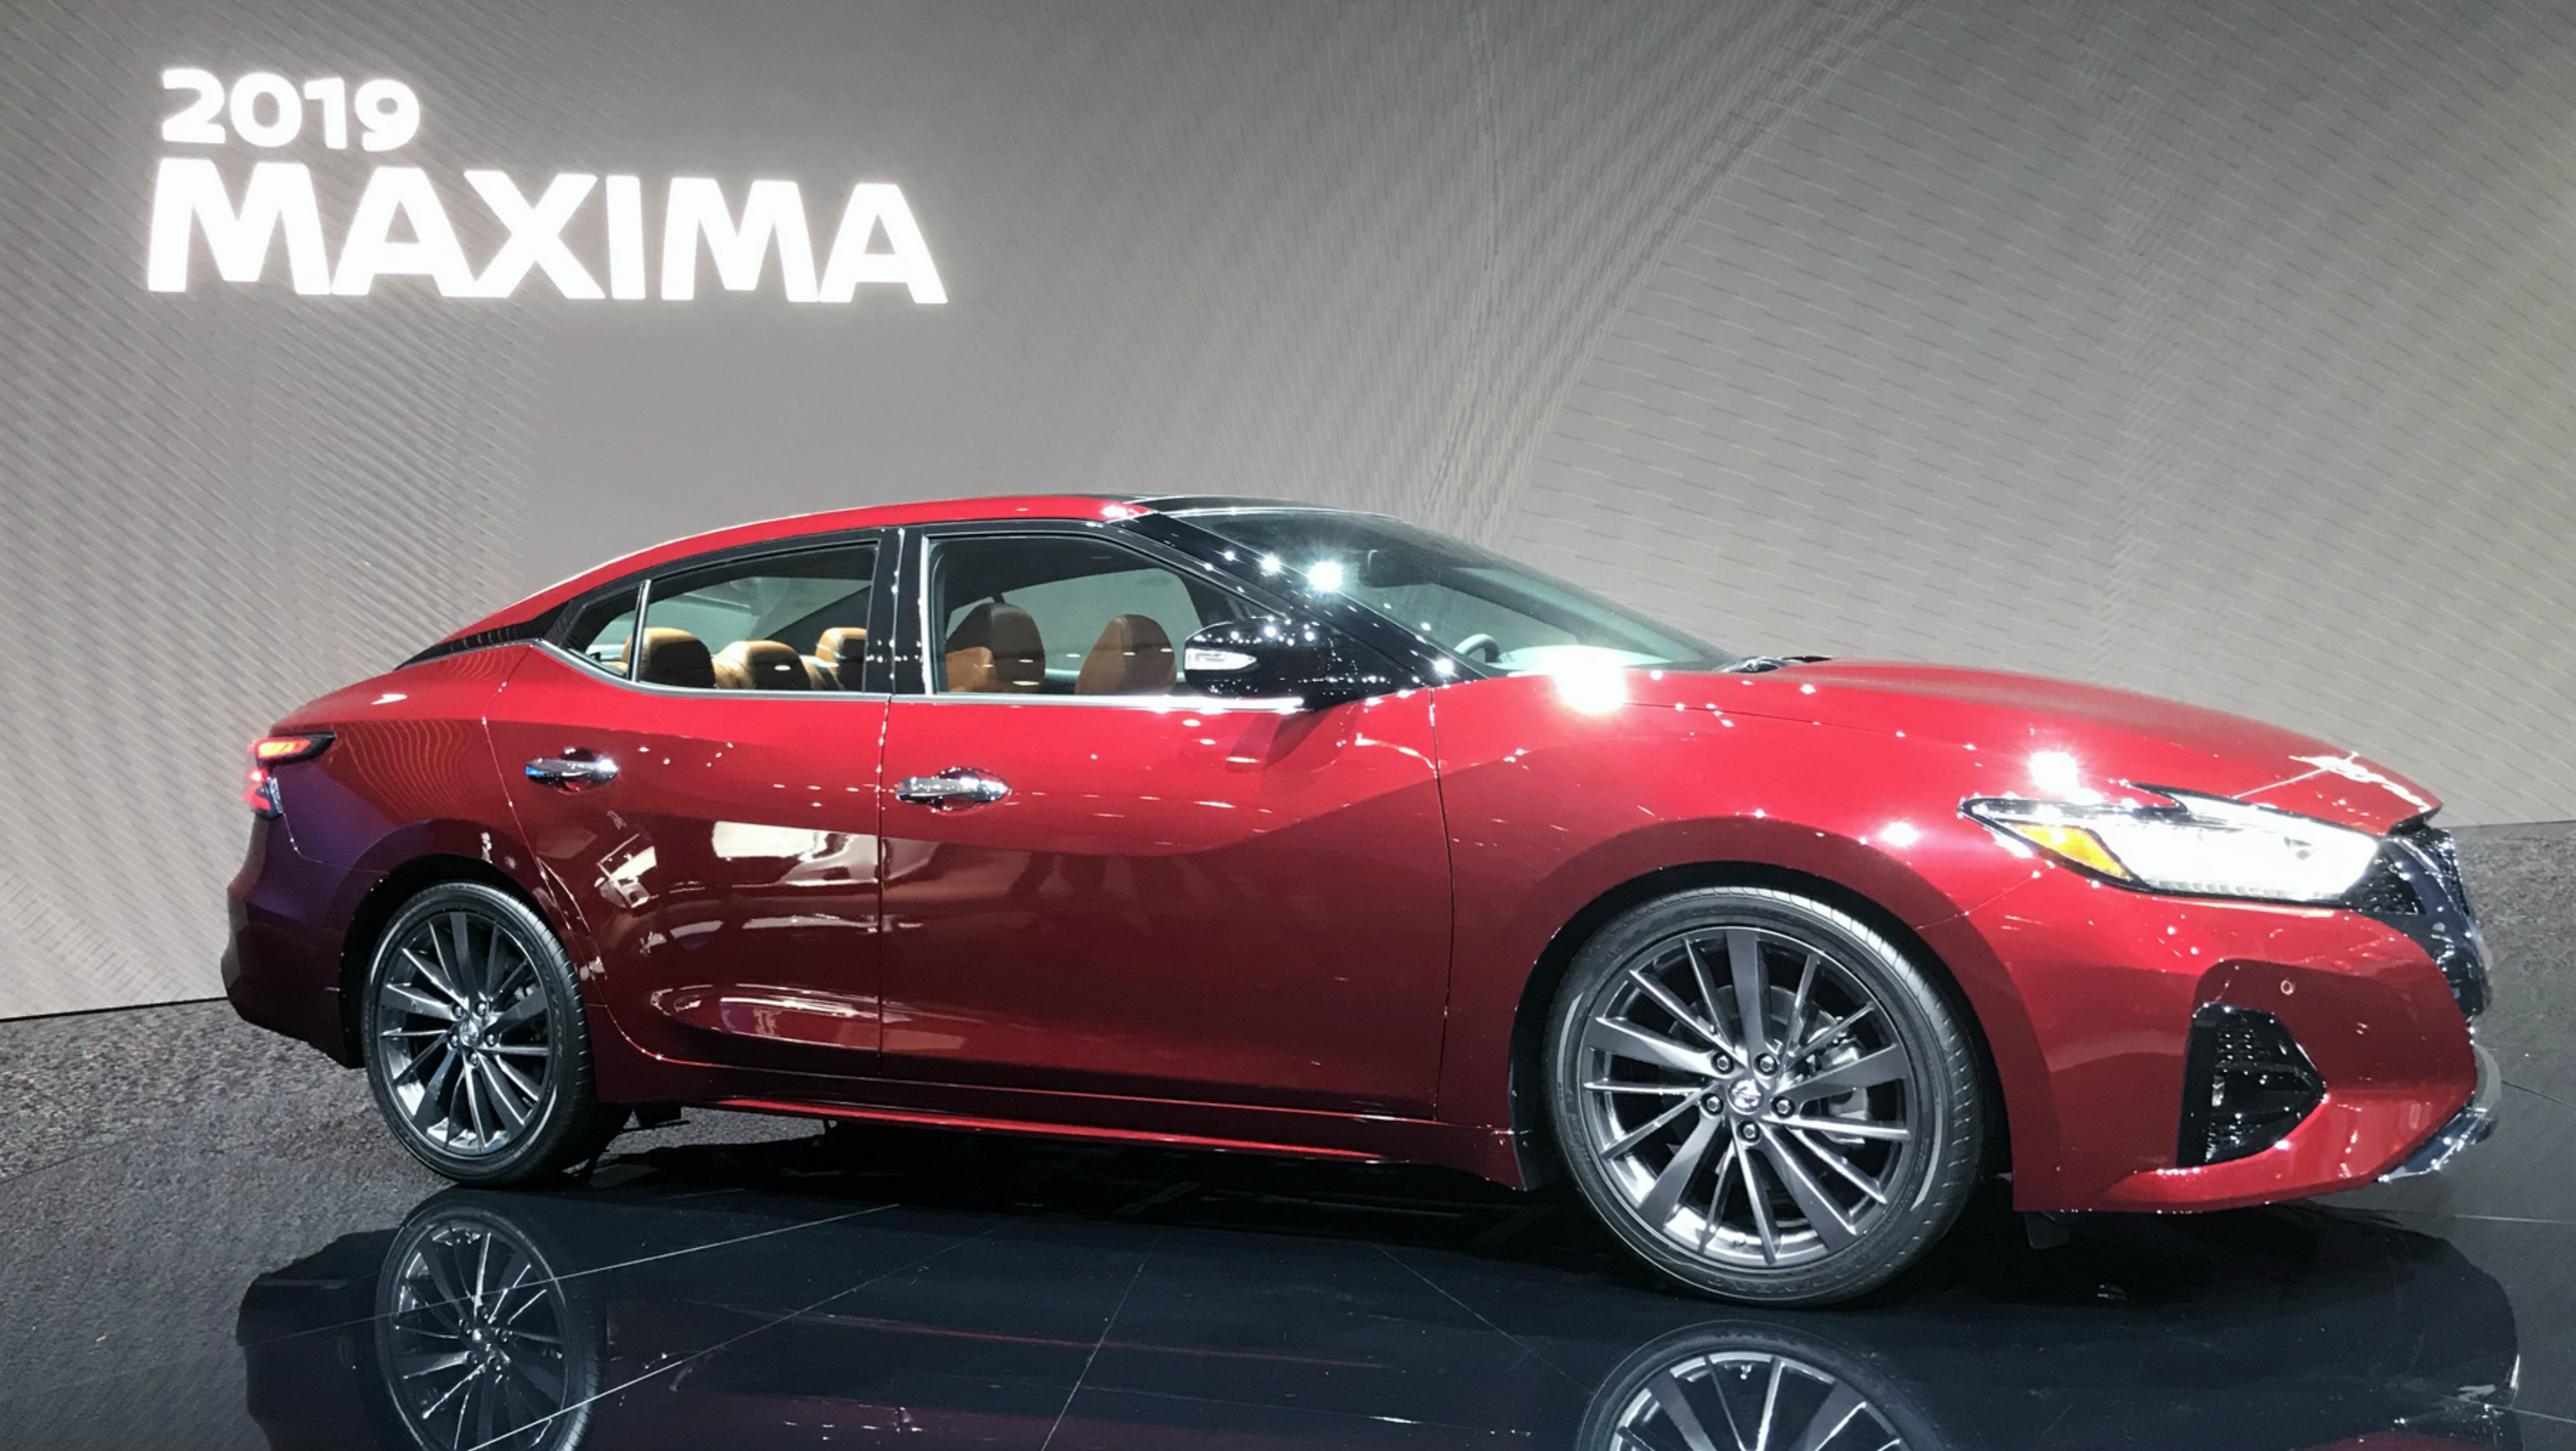 Maxima sports sedan